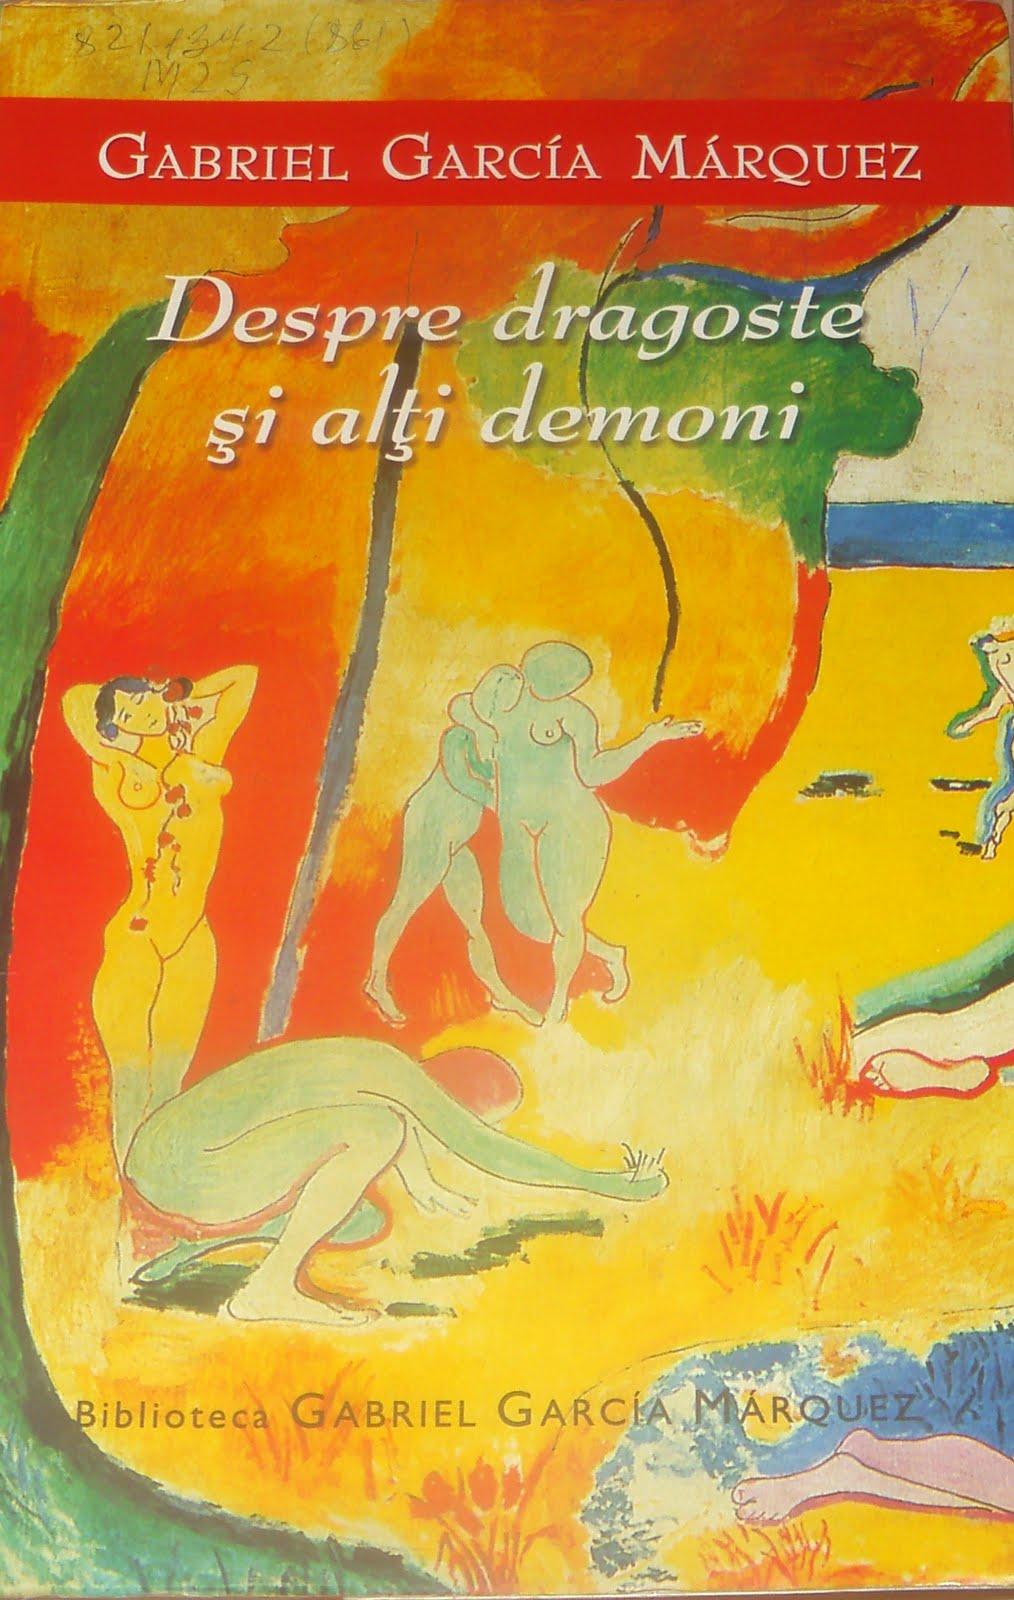 despre dragoste si alti demoni citate Liuba's Blog: Despre Dragoste și alți demoni despre dragoste si alti demoni citate